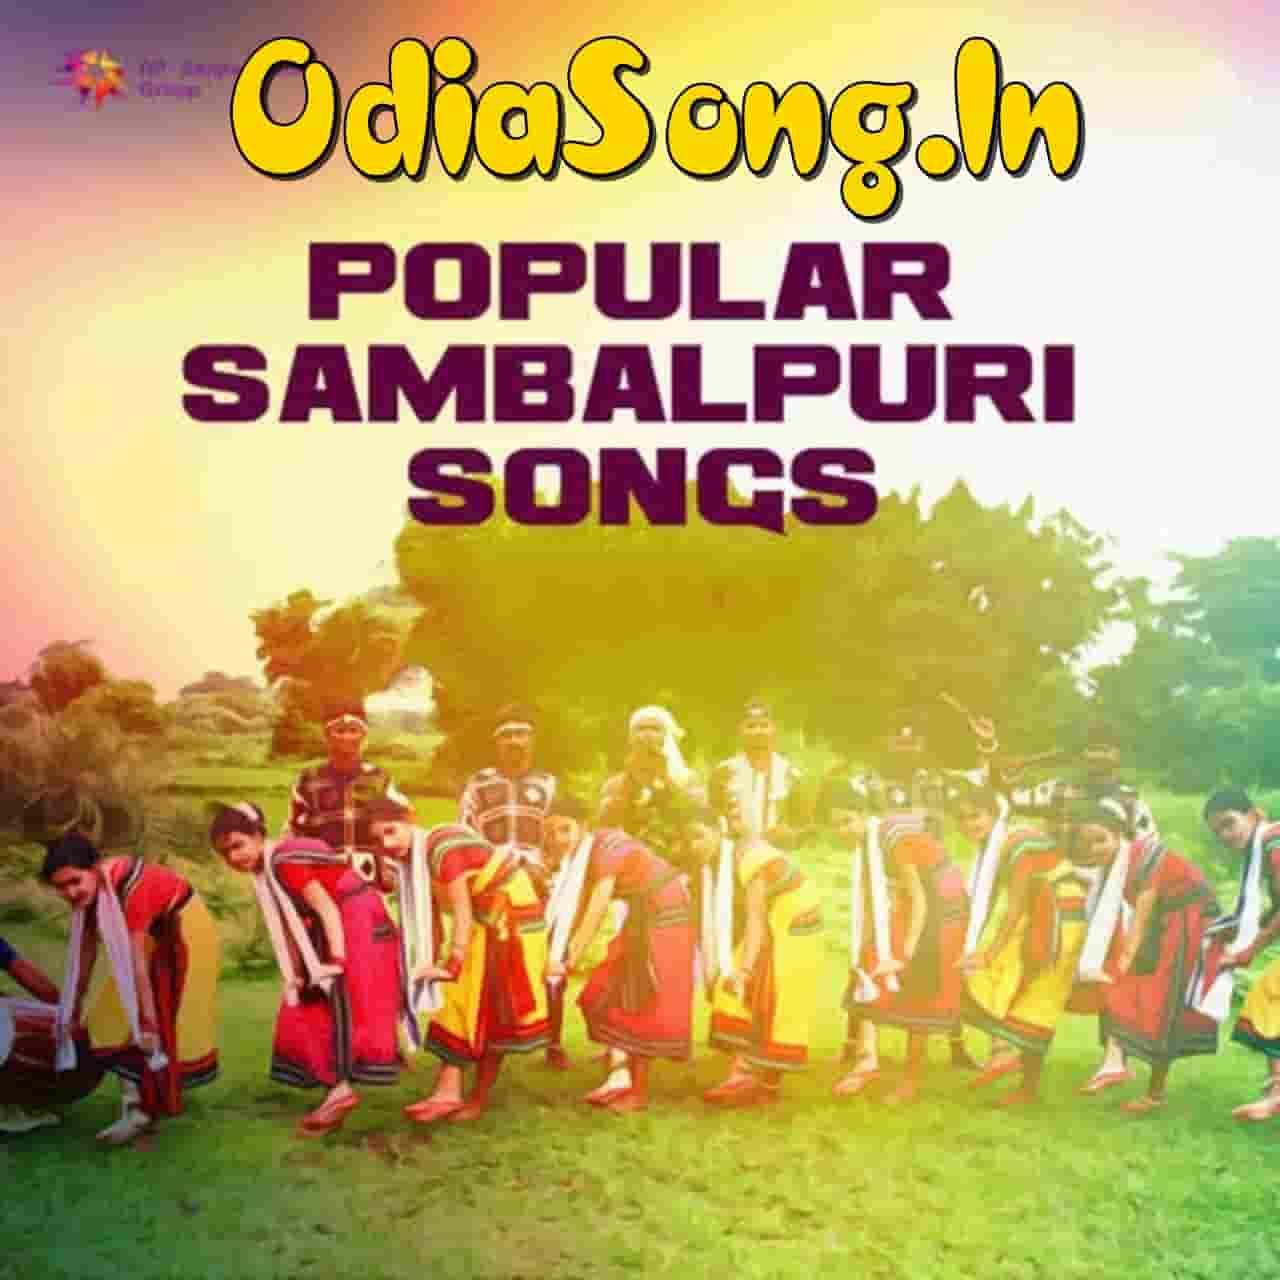 Bam Bam Bhole - Rimjhim Pani Style Sambalpuri Song By Iswara Deep